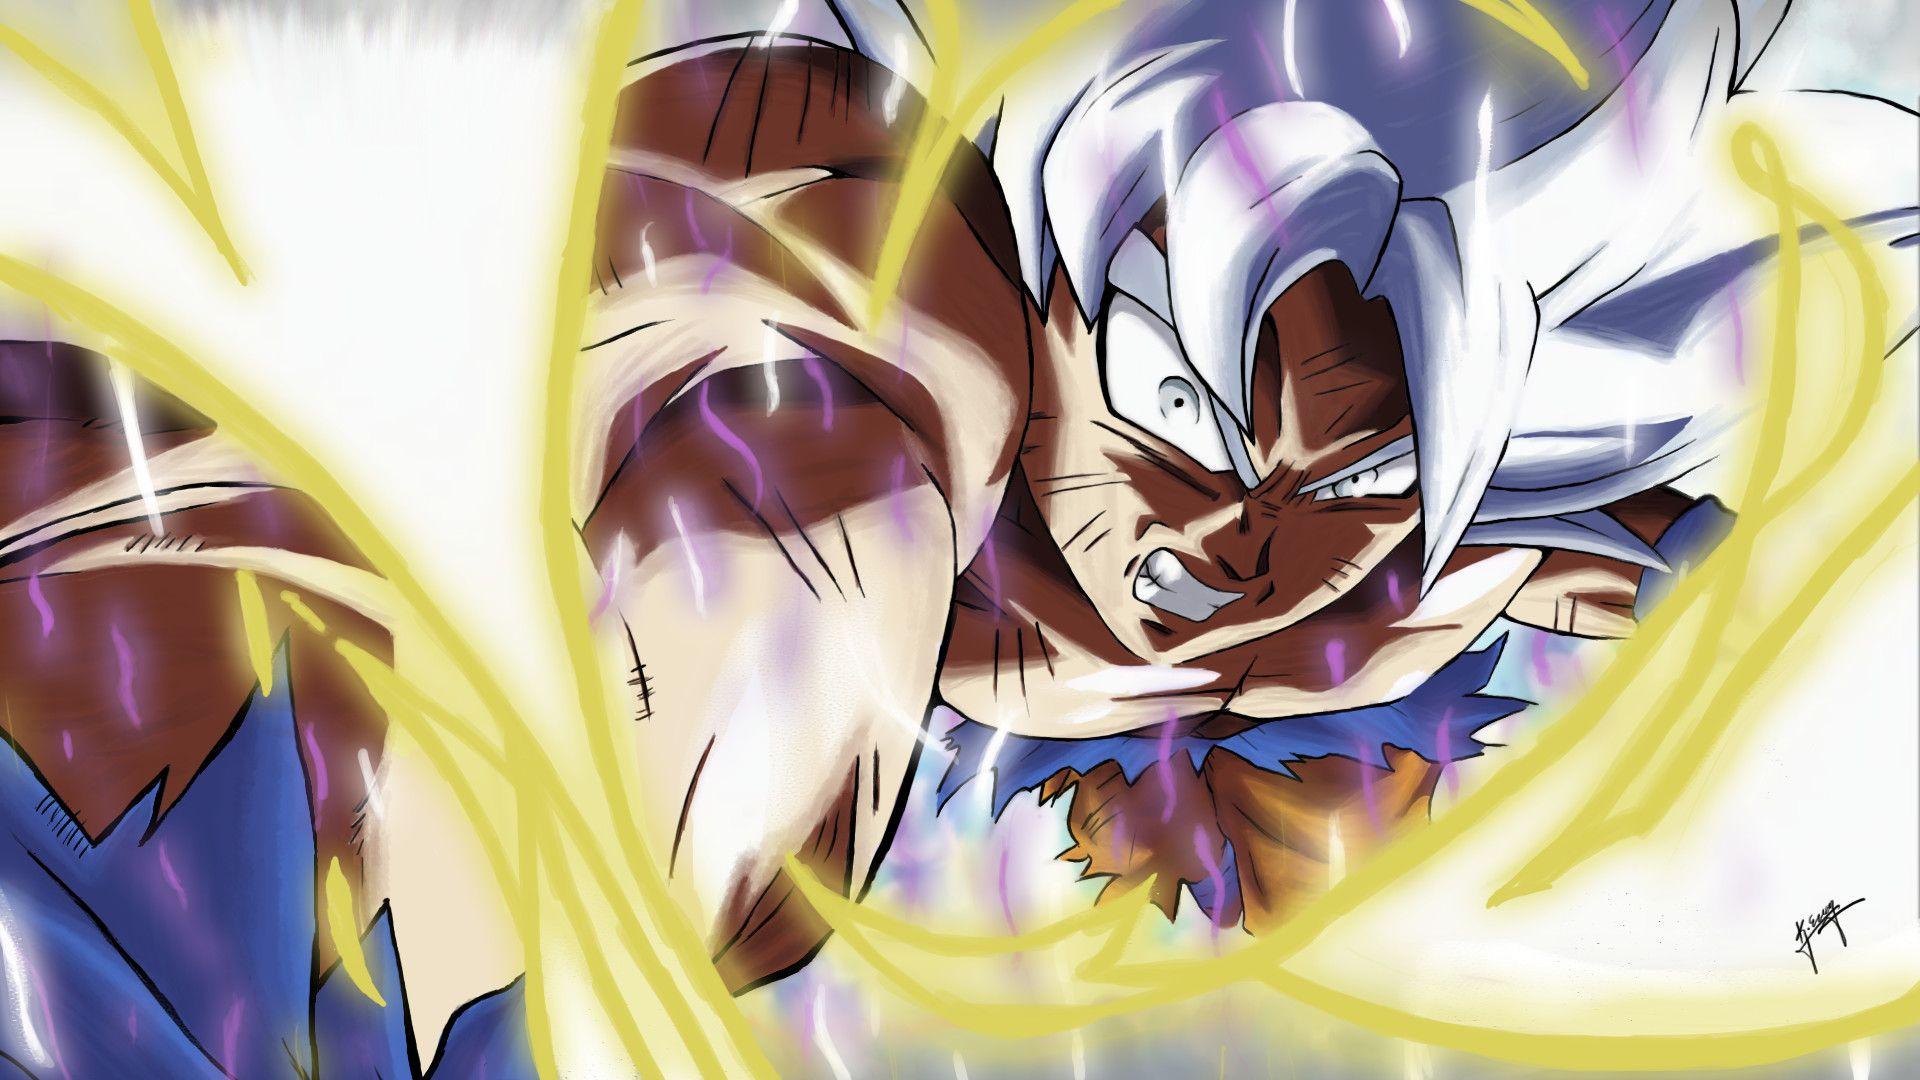 Goku Mastered Ultra Instinct Dragon Ball Super Goku Dragon Ball Dragon Ball Goku